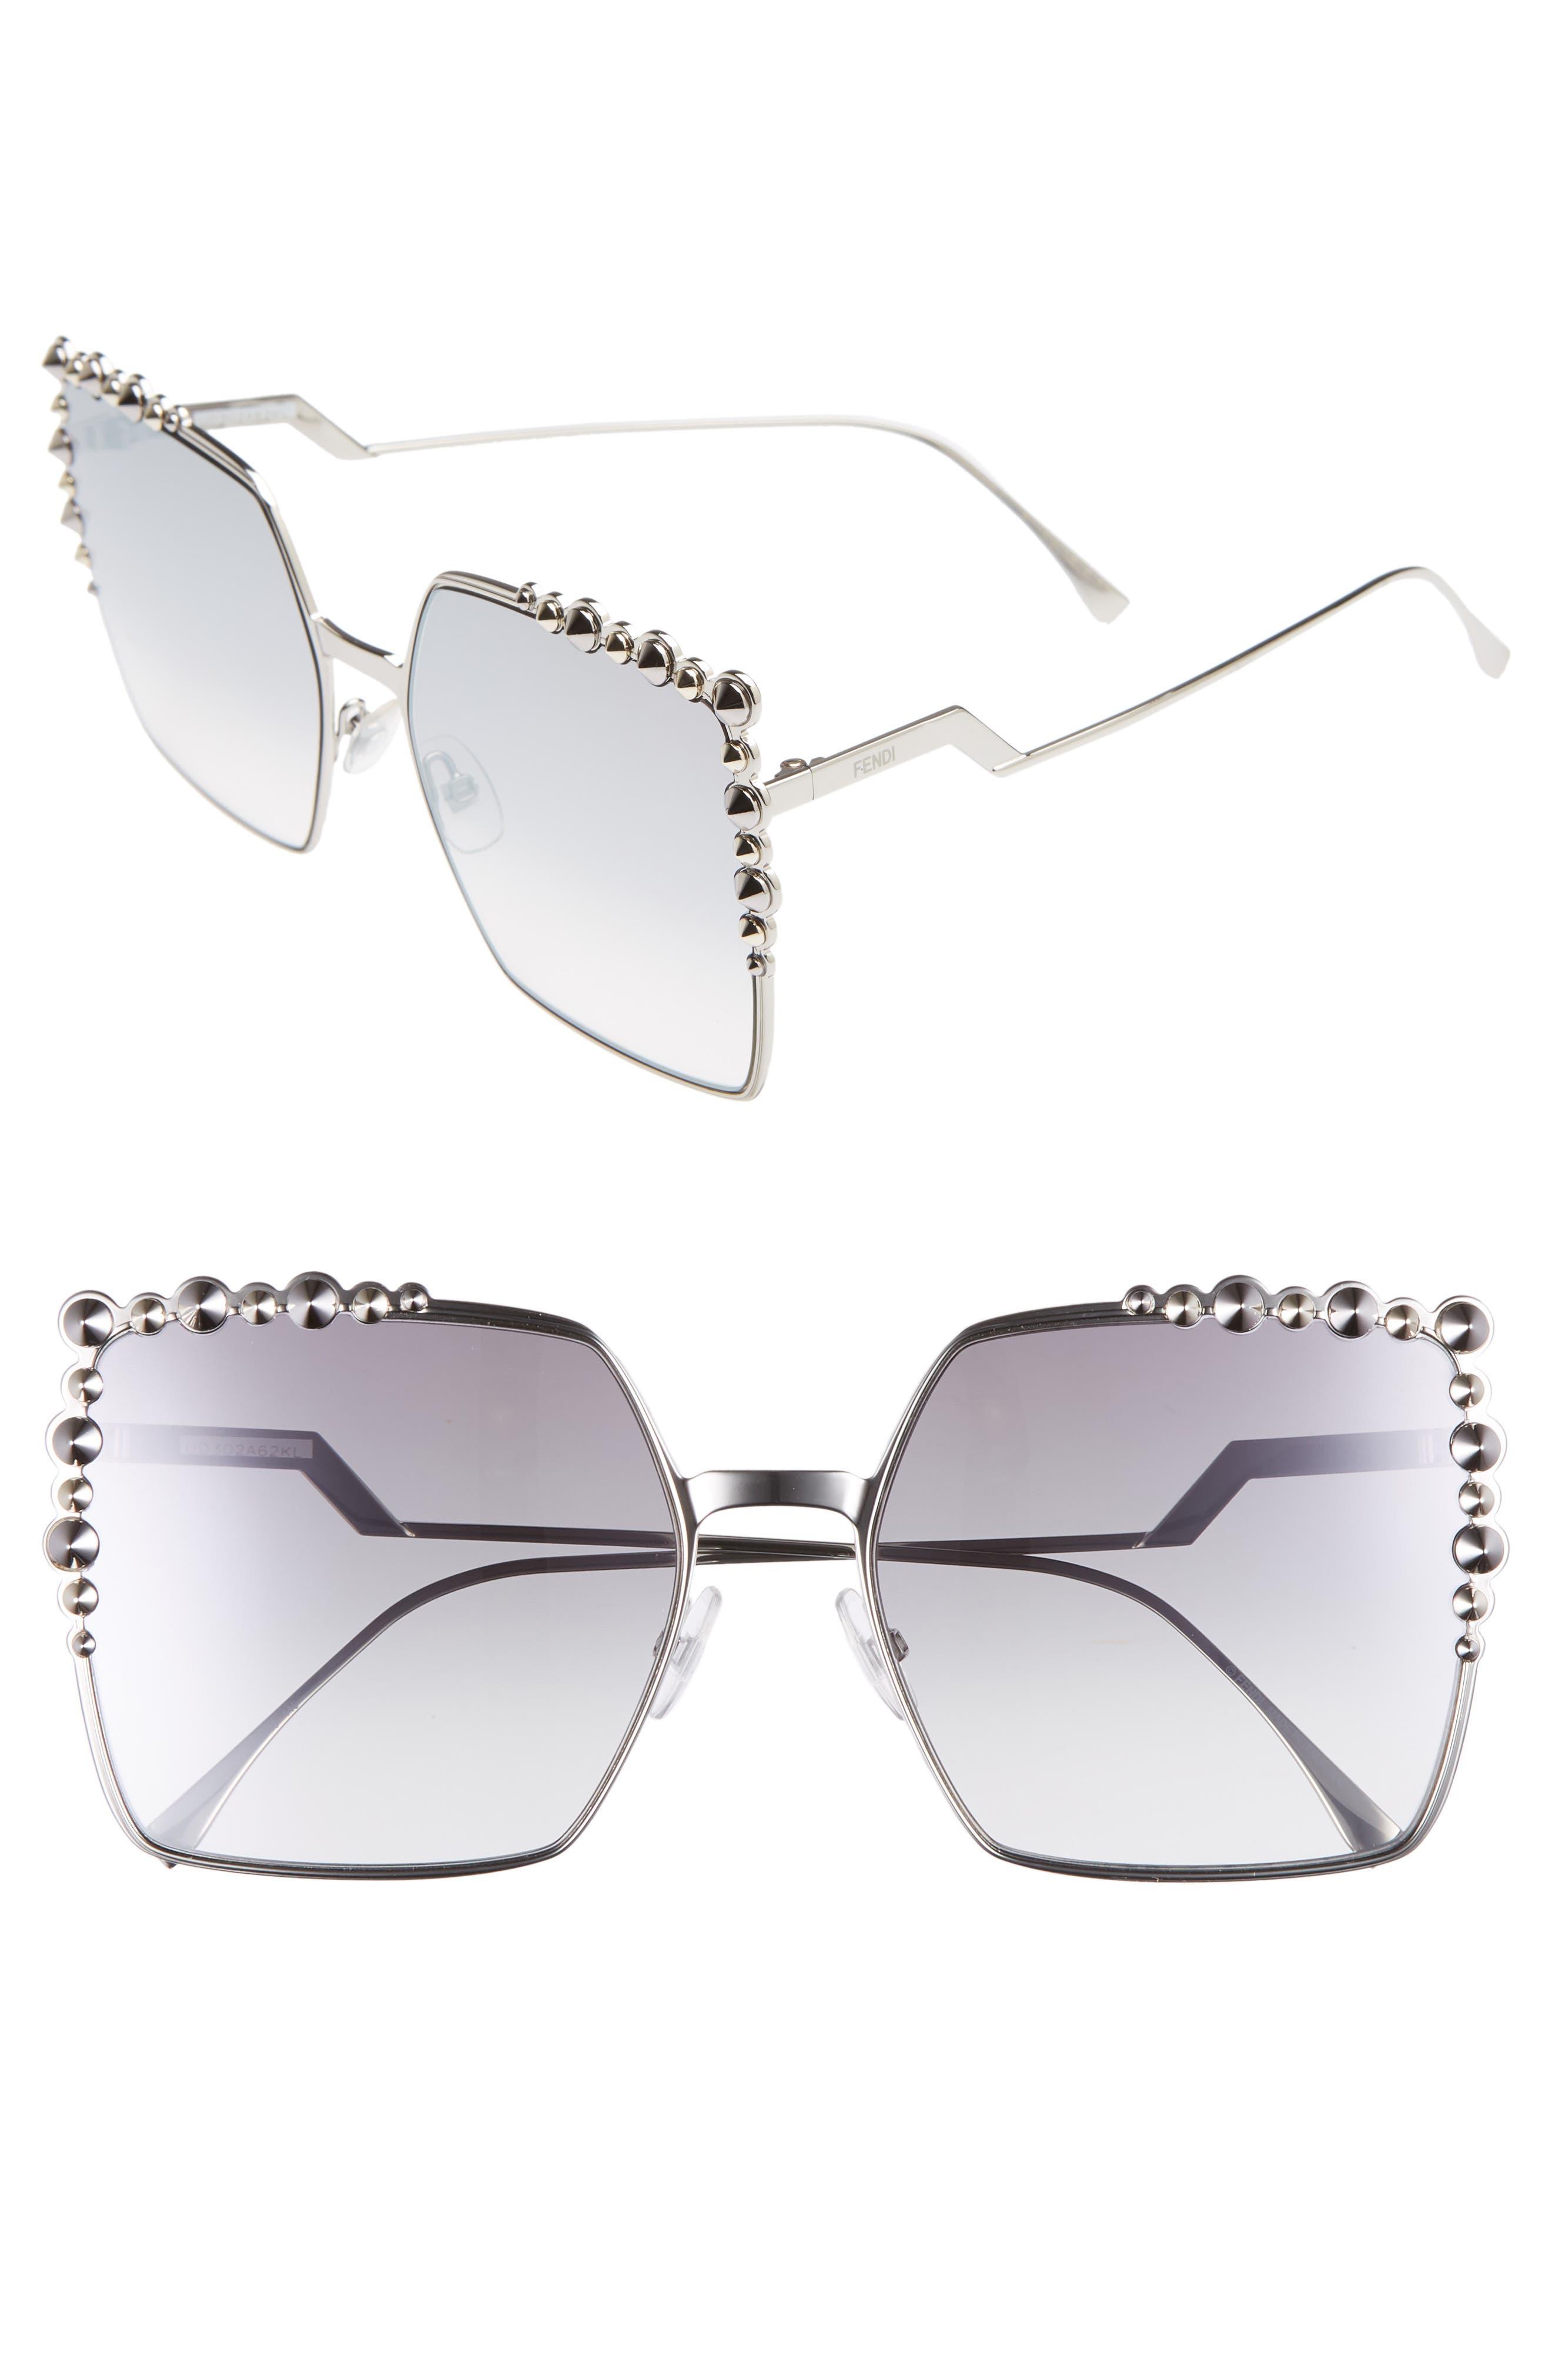 60mm Gradient Square Cat Eye Sunglasses,                         Main,                         color, 043